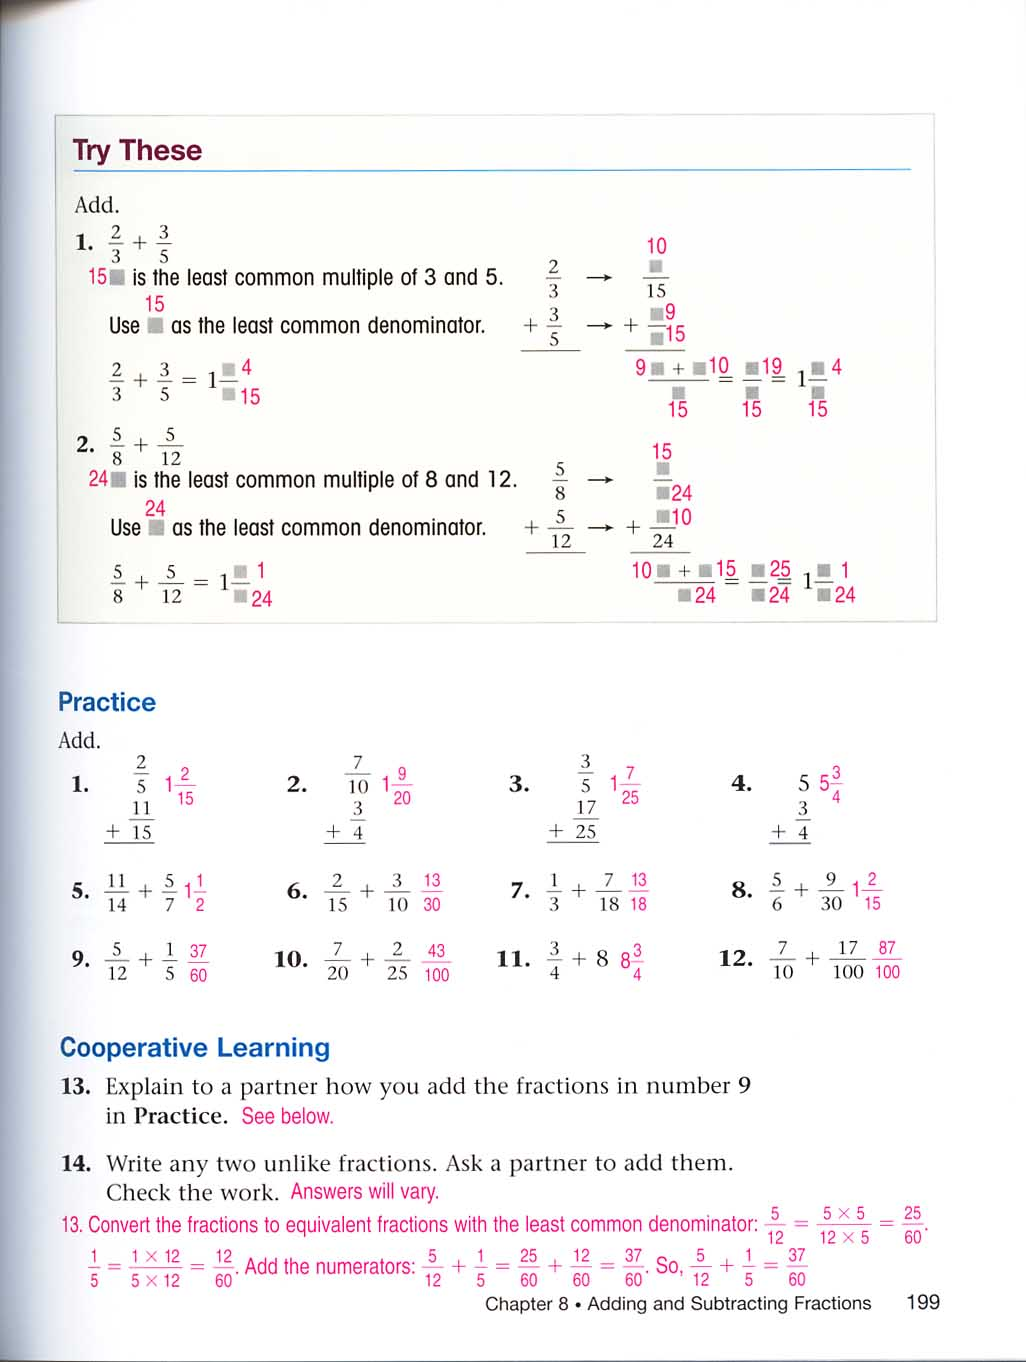 Pacemaker Pre-Algebra Teacheru0026#39;s Answer Edition